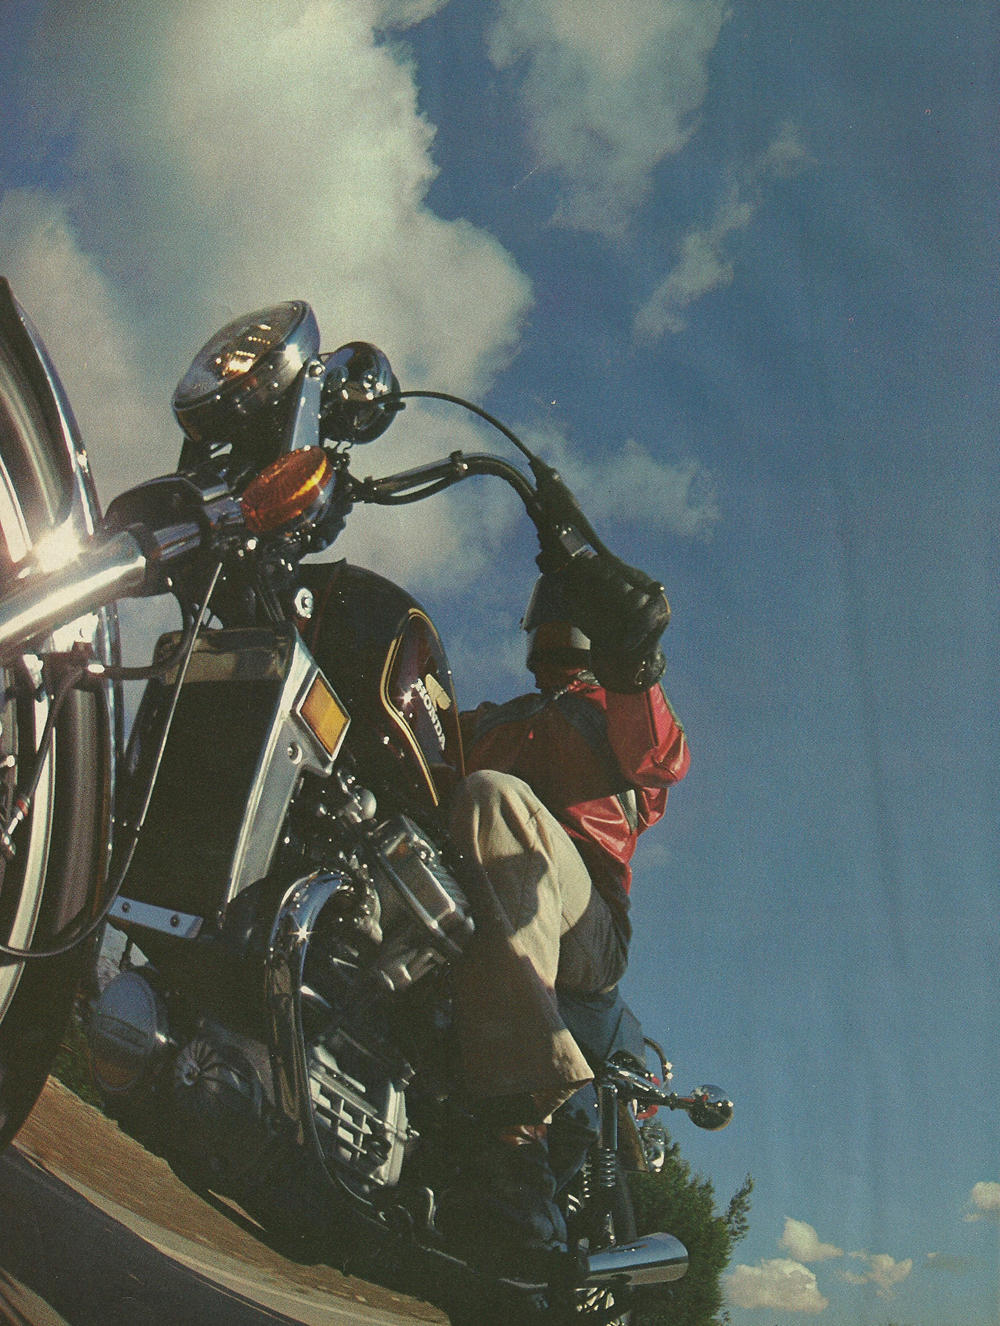 1979 Honda CX500 vs Harley FXS-80 Lowrider 3.jpg